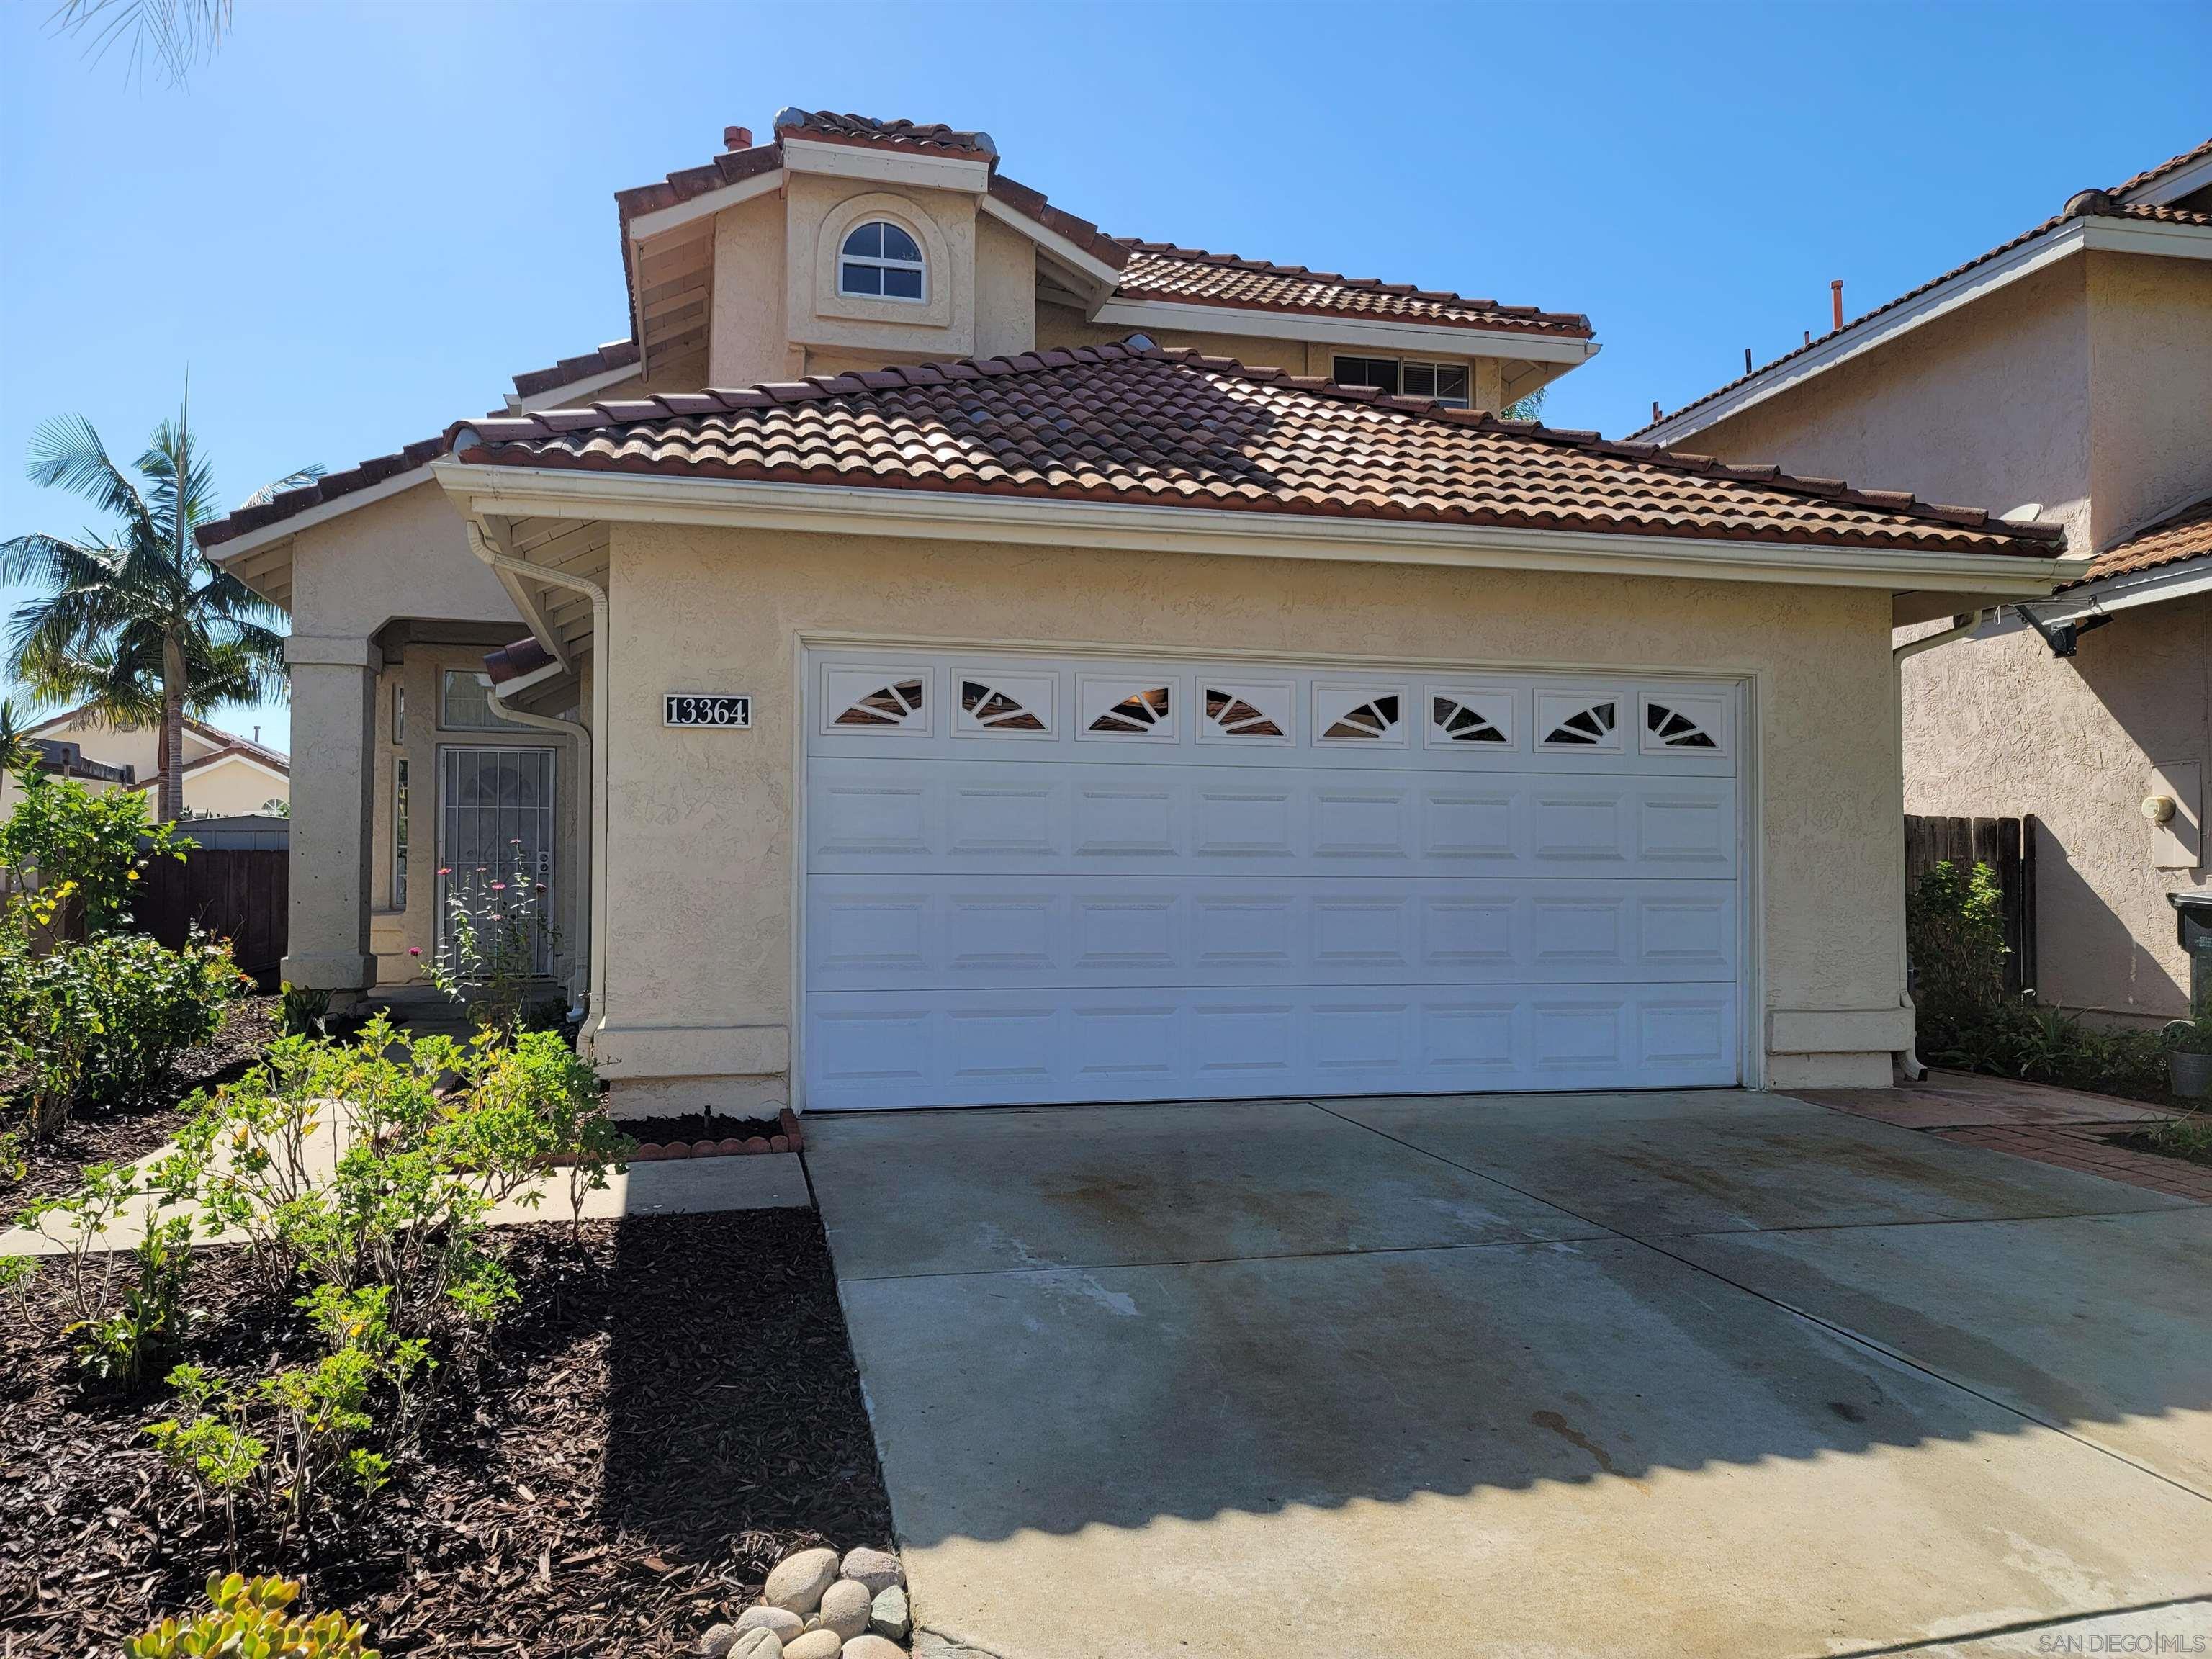 13364 Darview Ln, San Diego, CA 92129